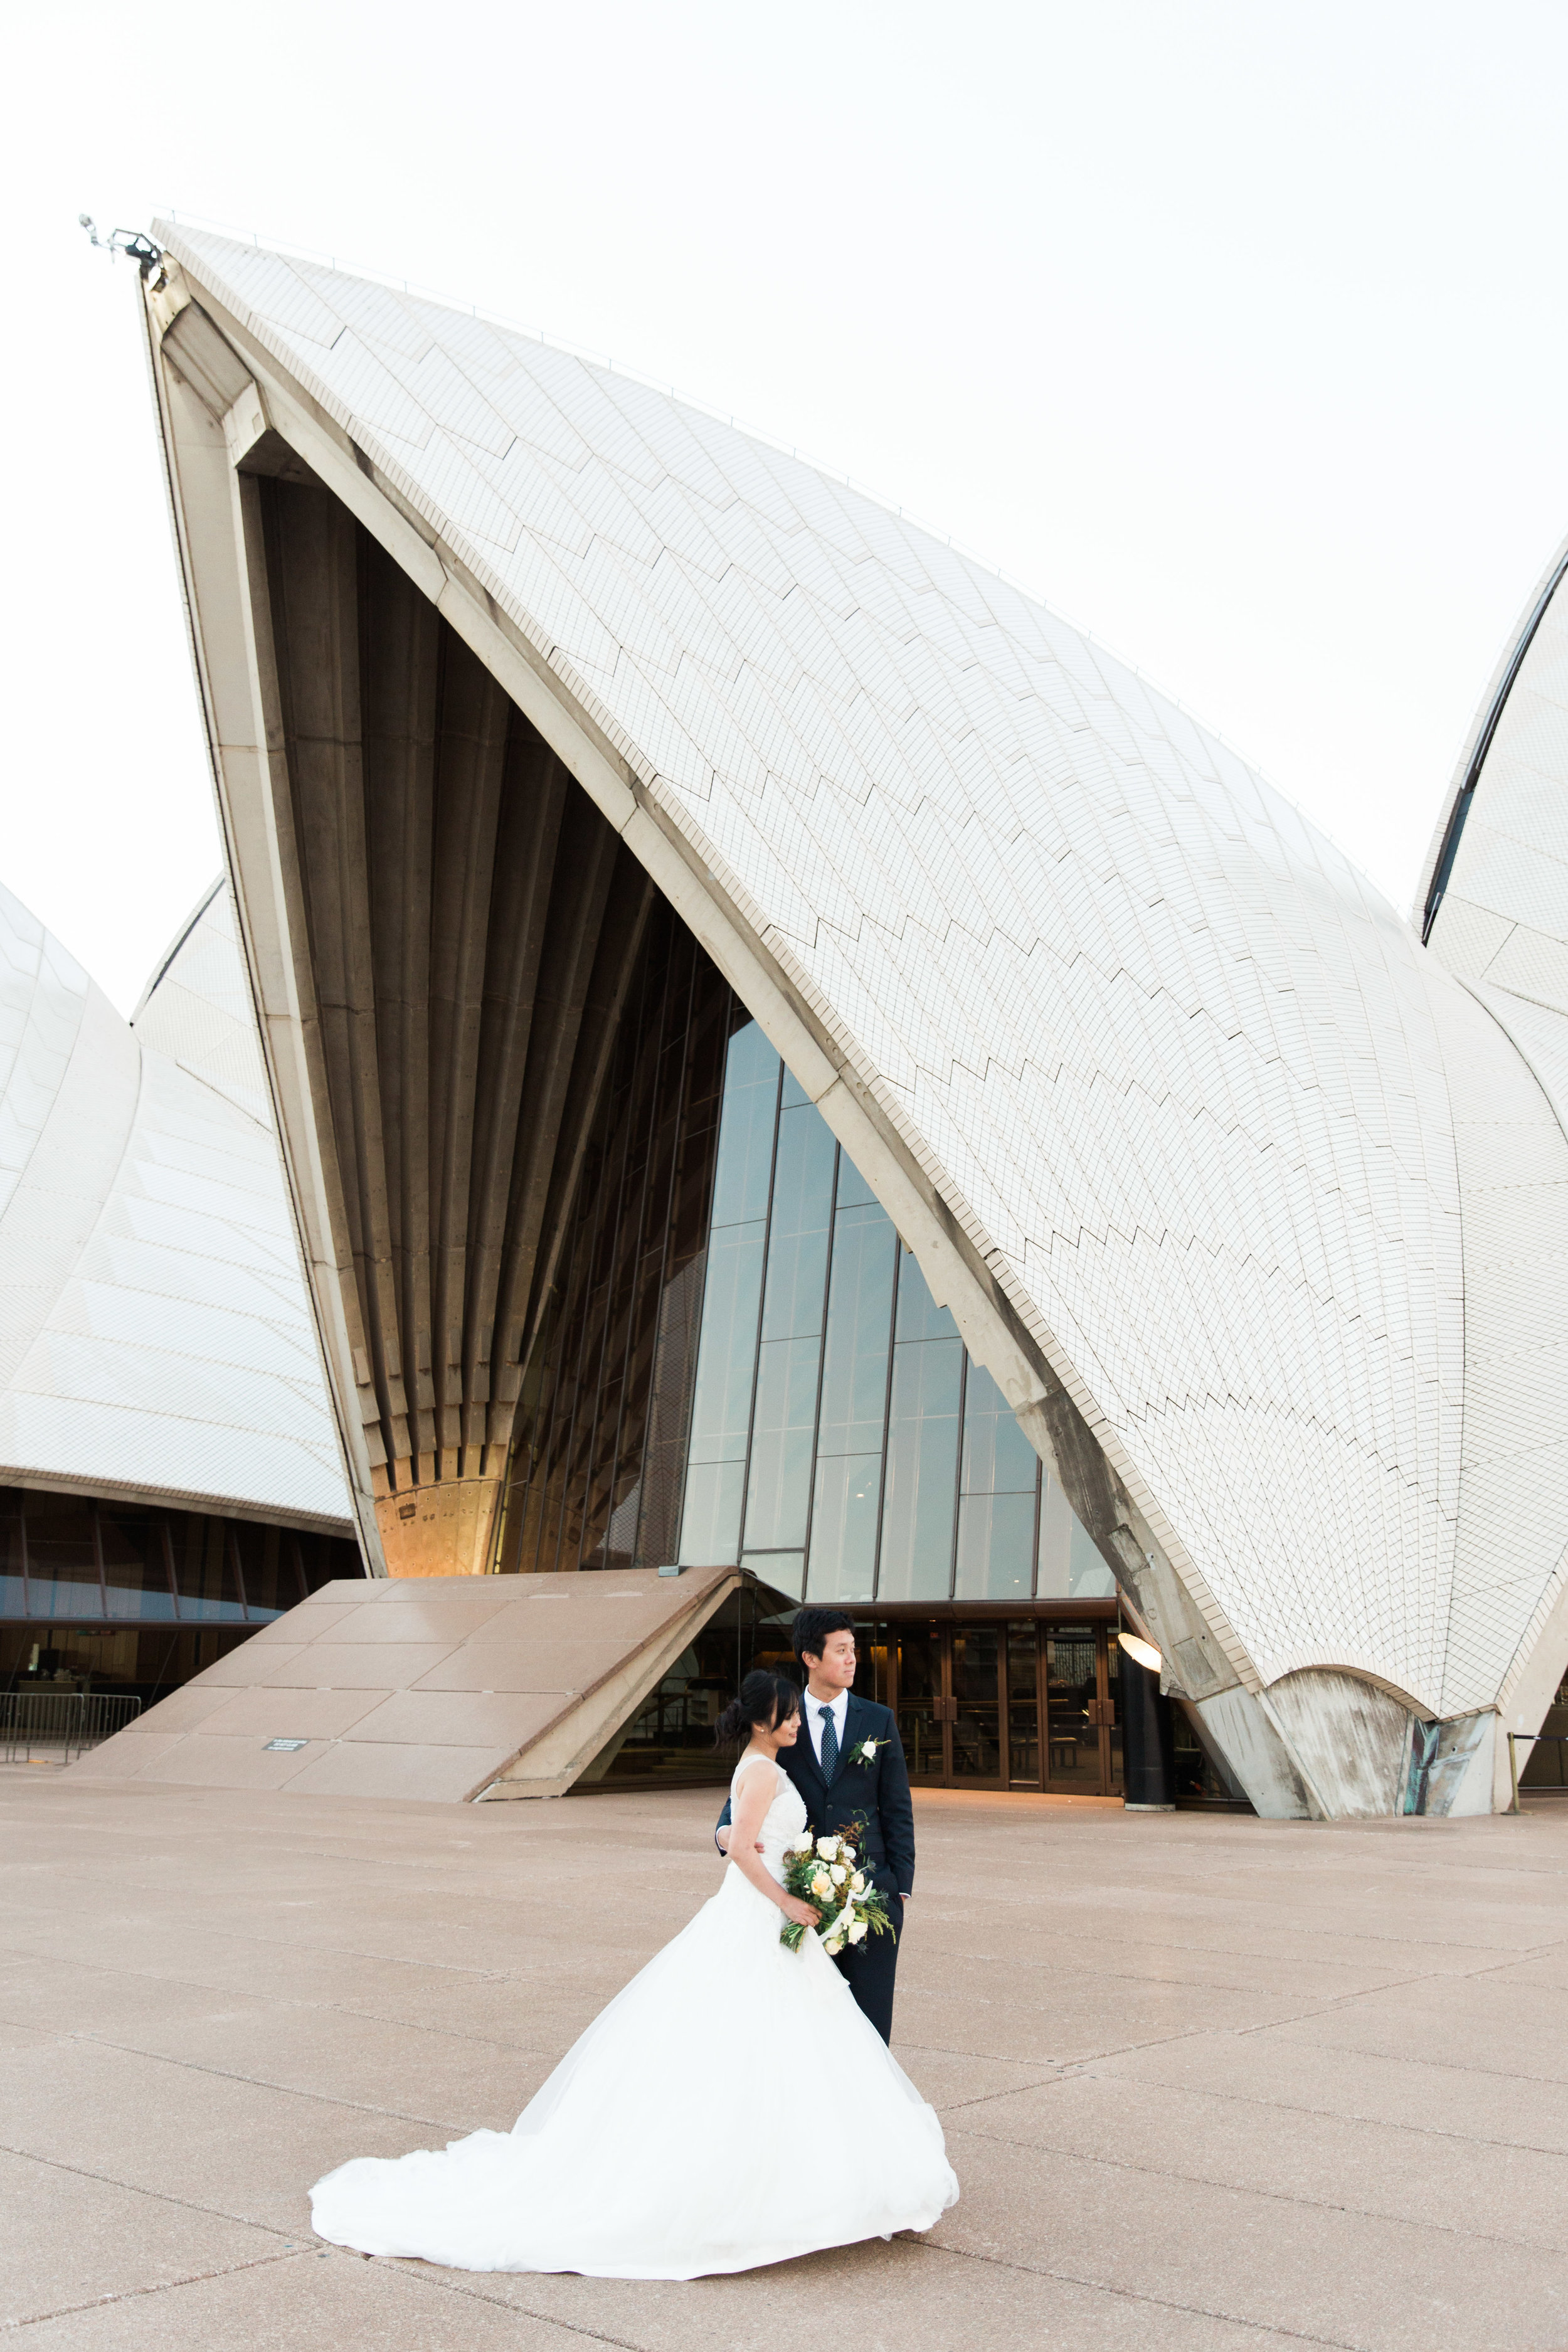 00053- Australia Sydney Wedding Photographer Sheri McMahon.jpg